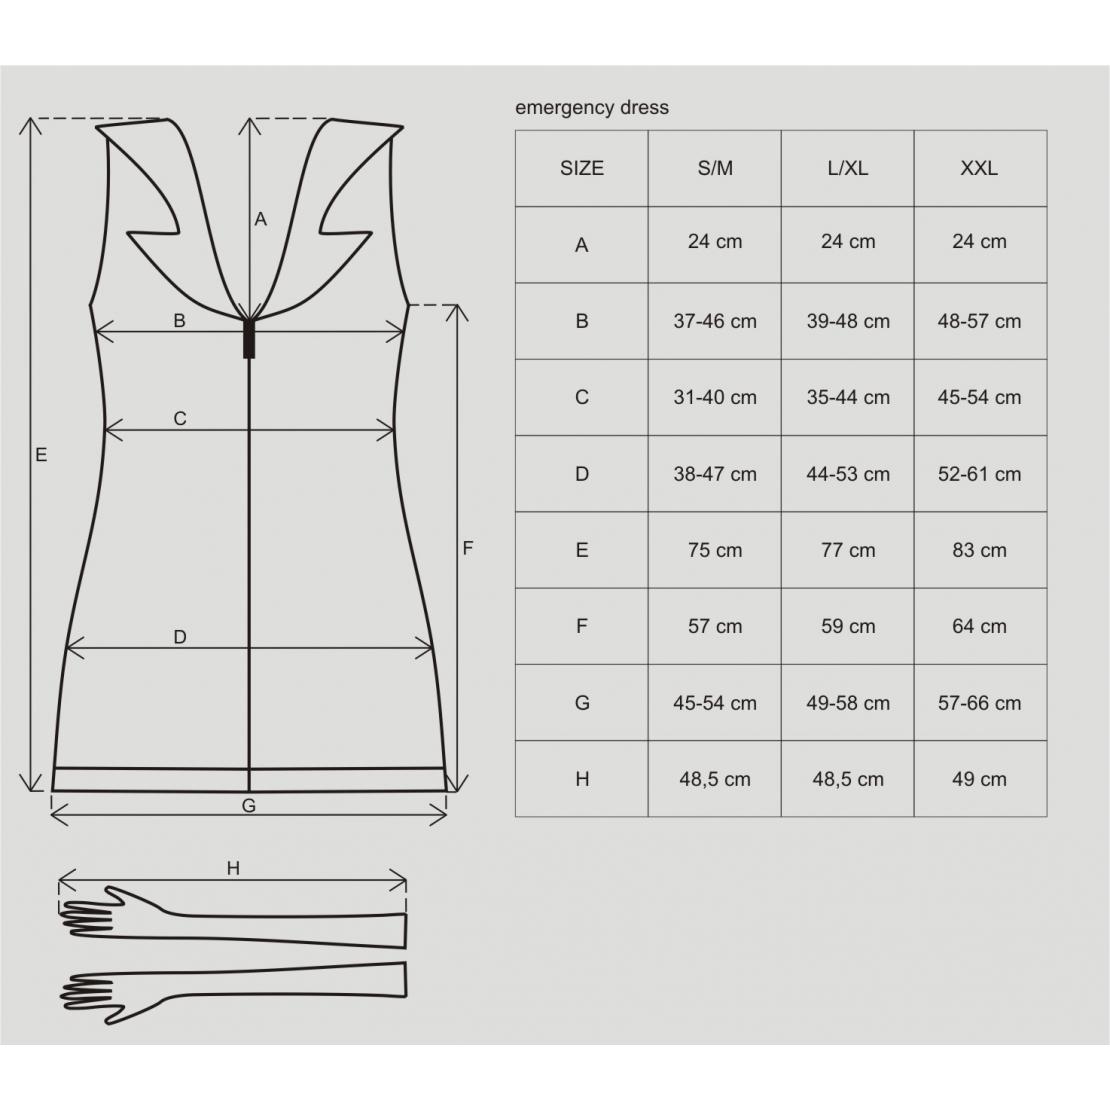 COSTUME INFERMIERA SEXY CON STETOSCOPIO EMERGENCY DRESS